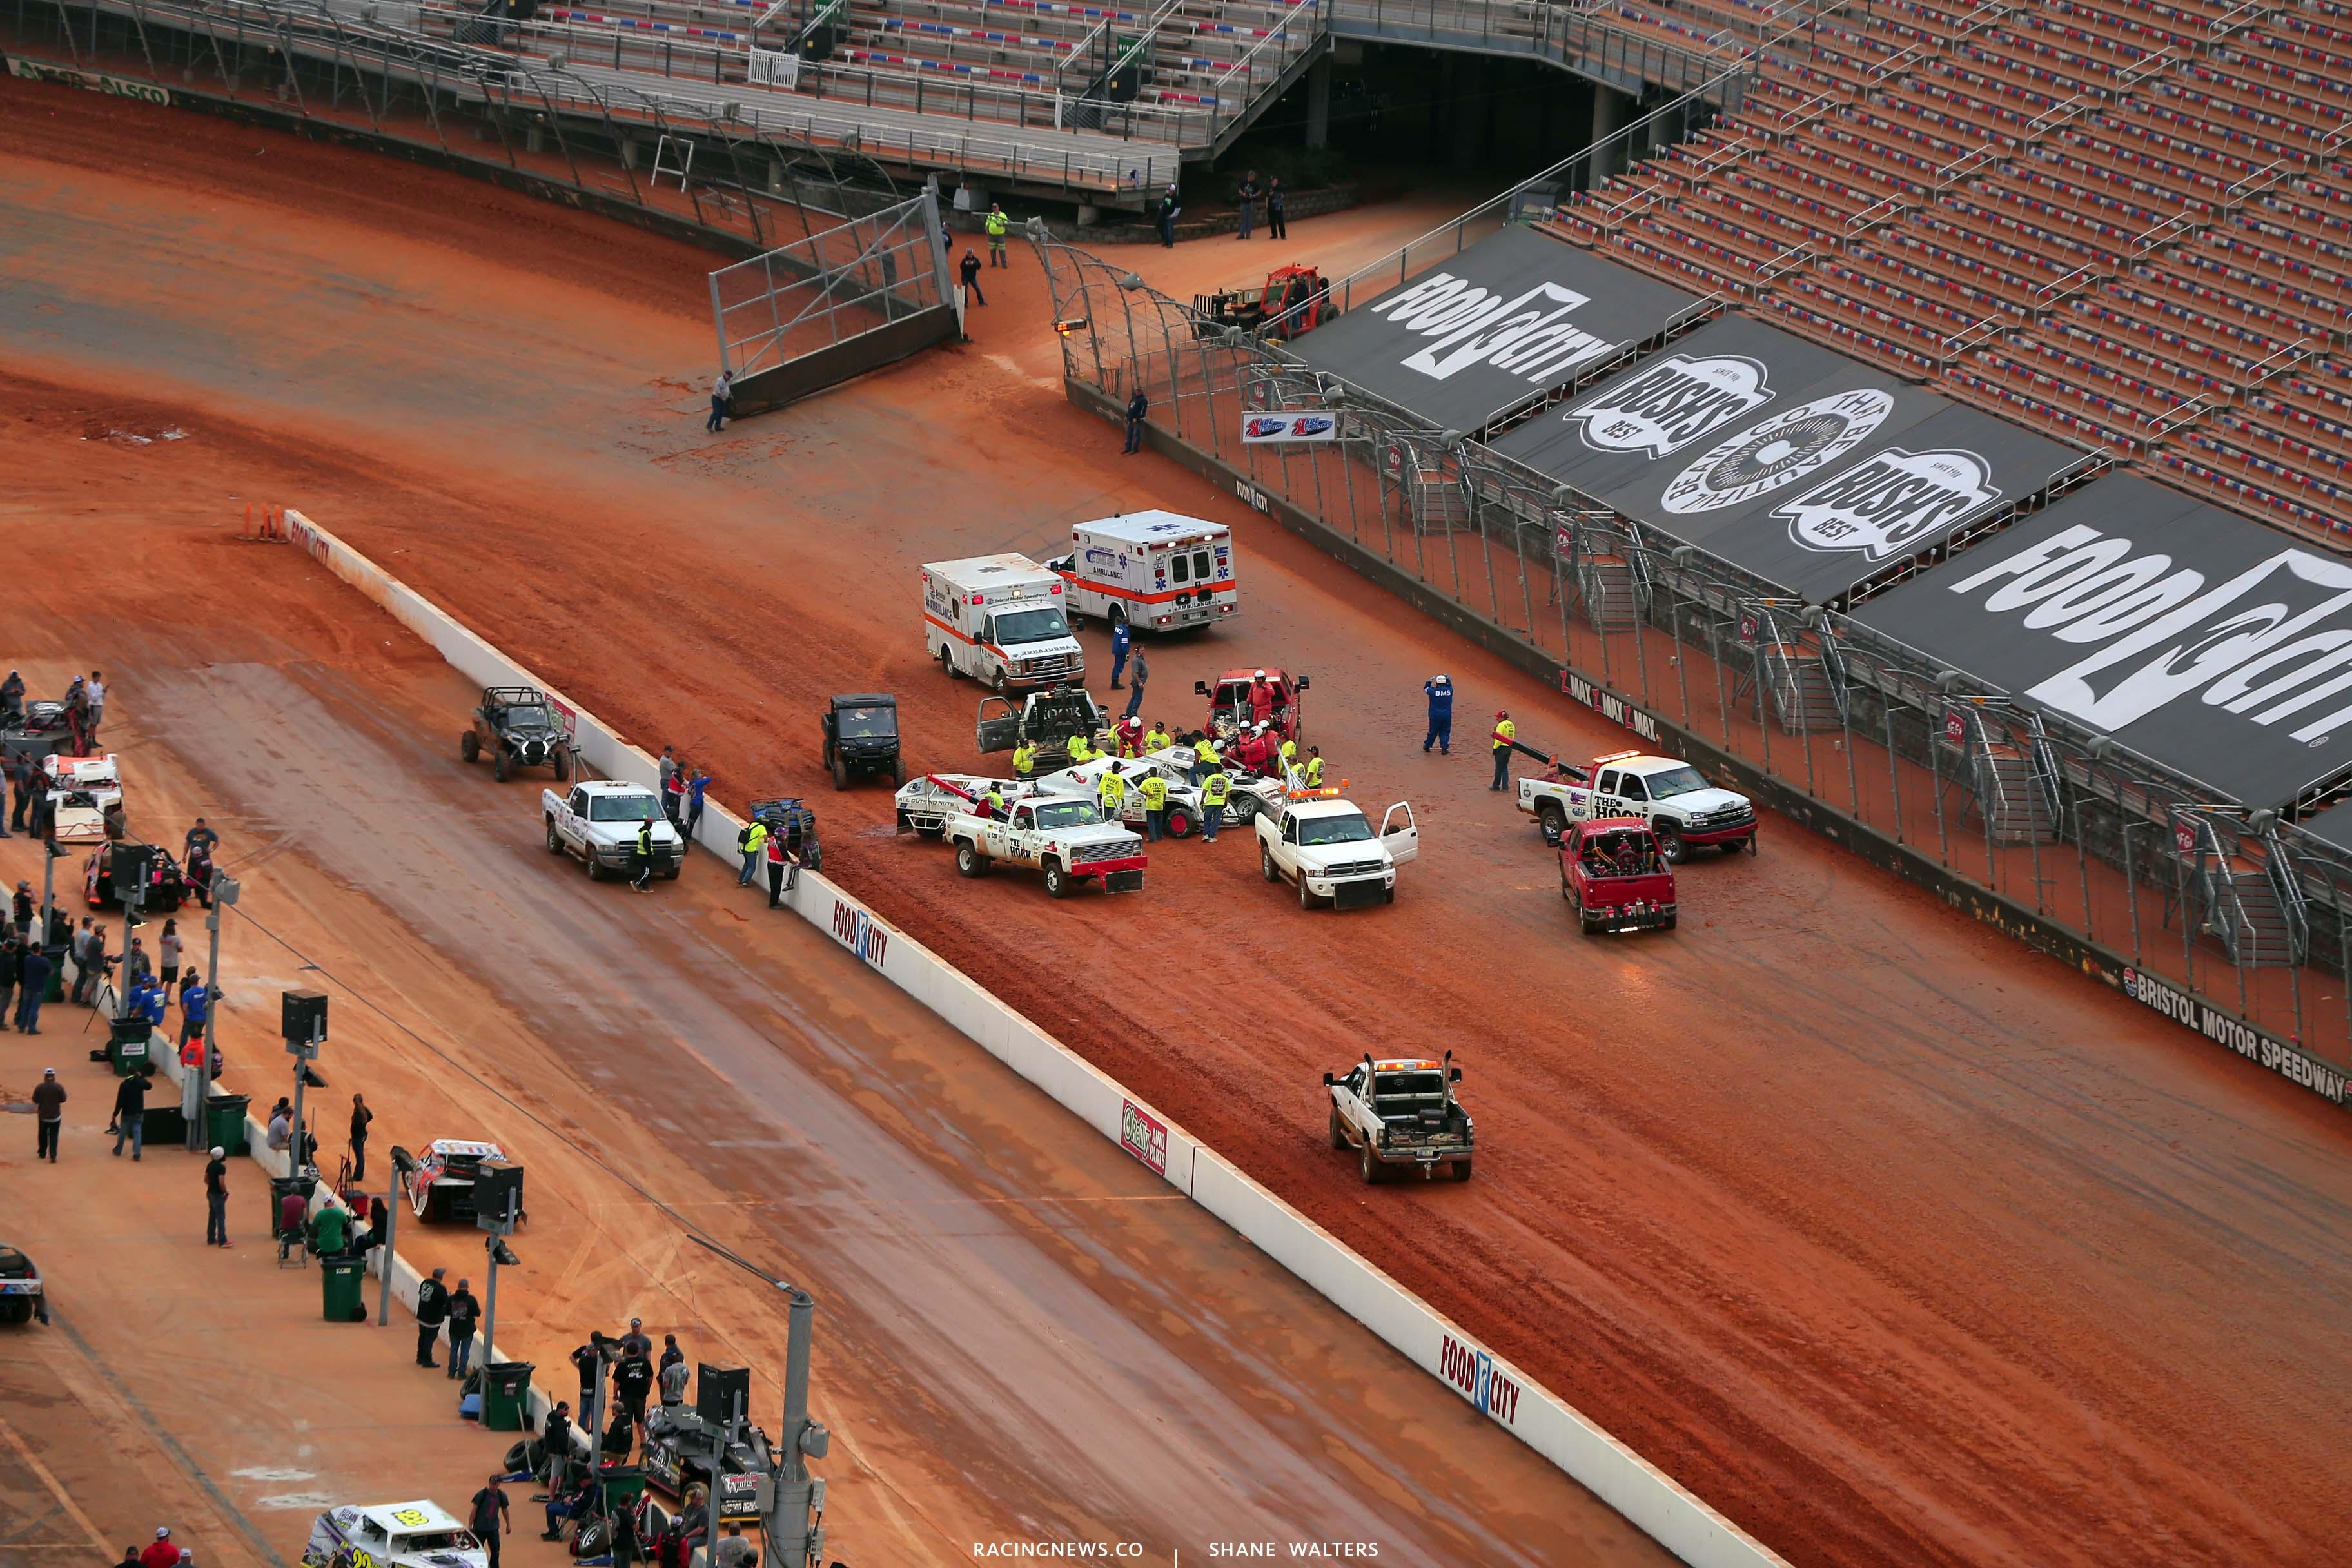 V - Dirt modified crash at Bristol Motor Speedway dirt track